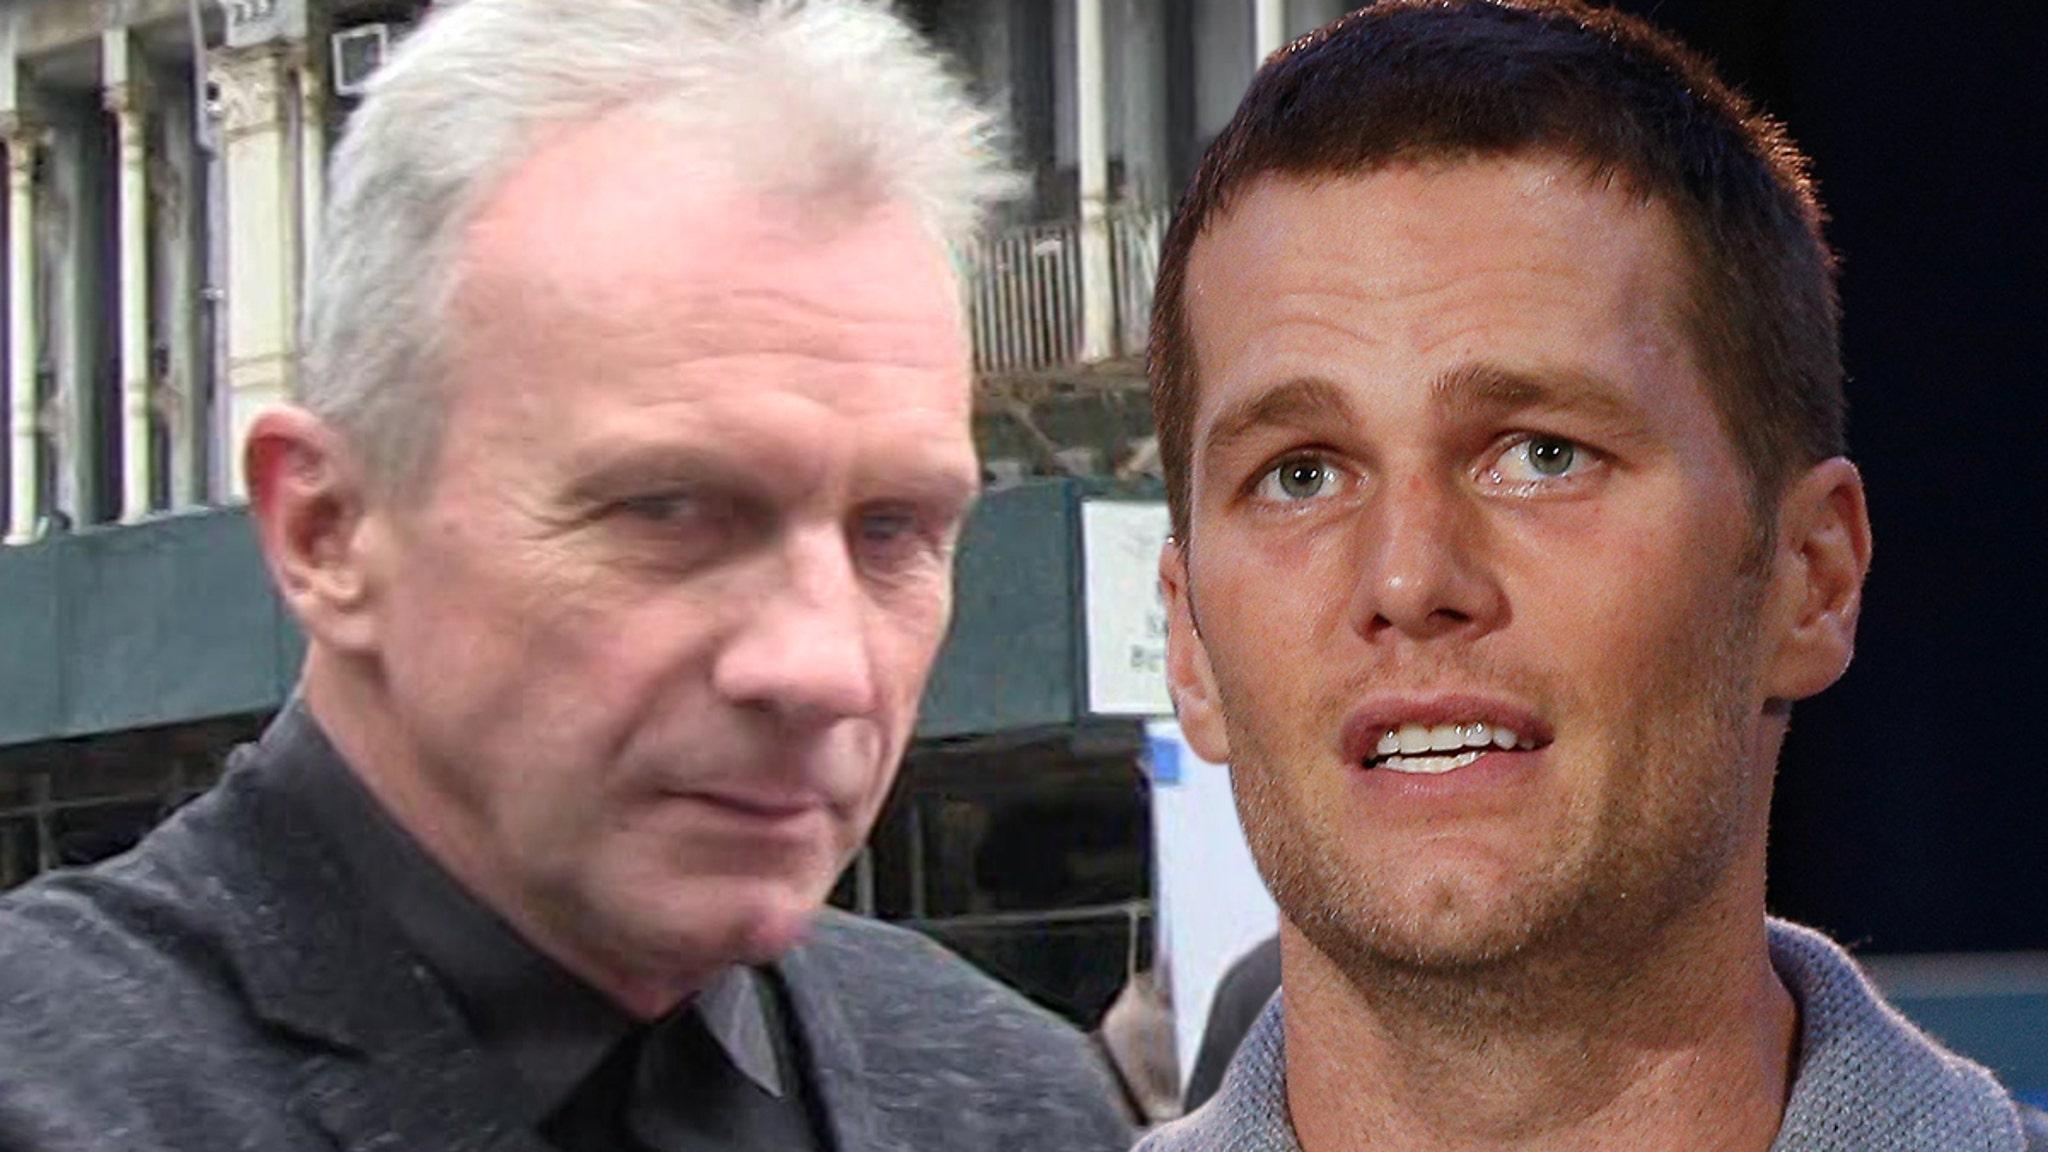 Joe Montana Shades Patriots Over Tom Brady's Exit, 'Somebody Made A Mistake'